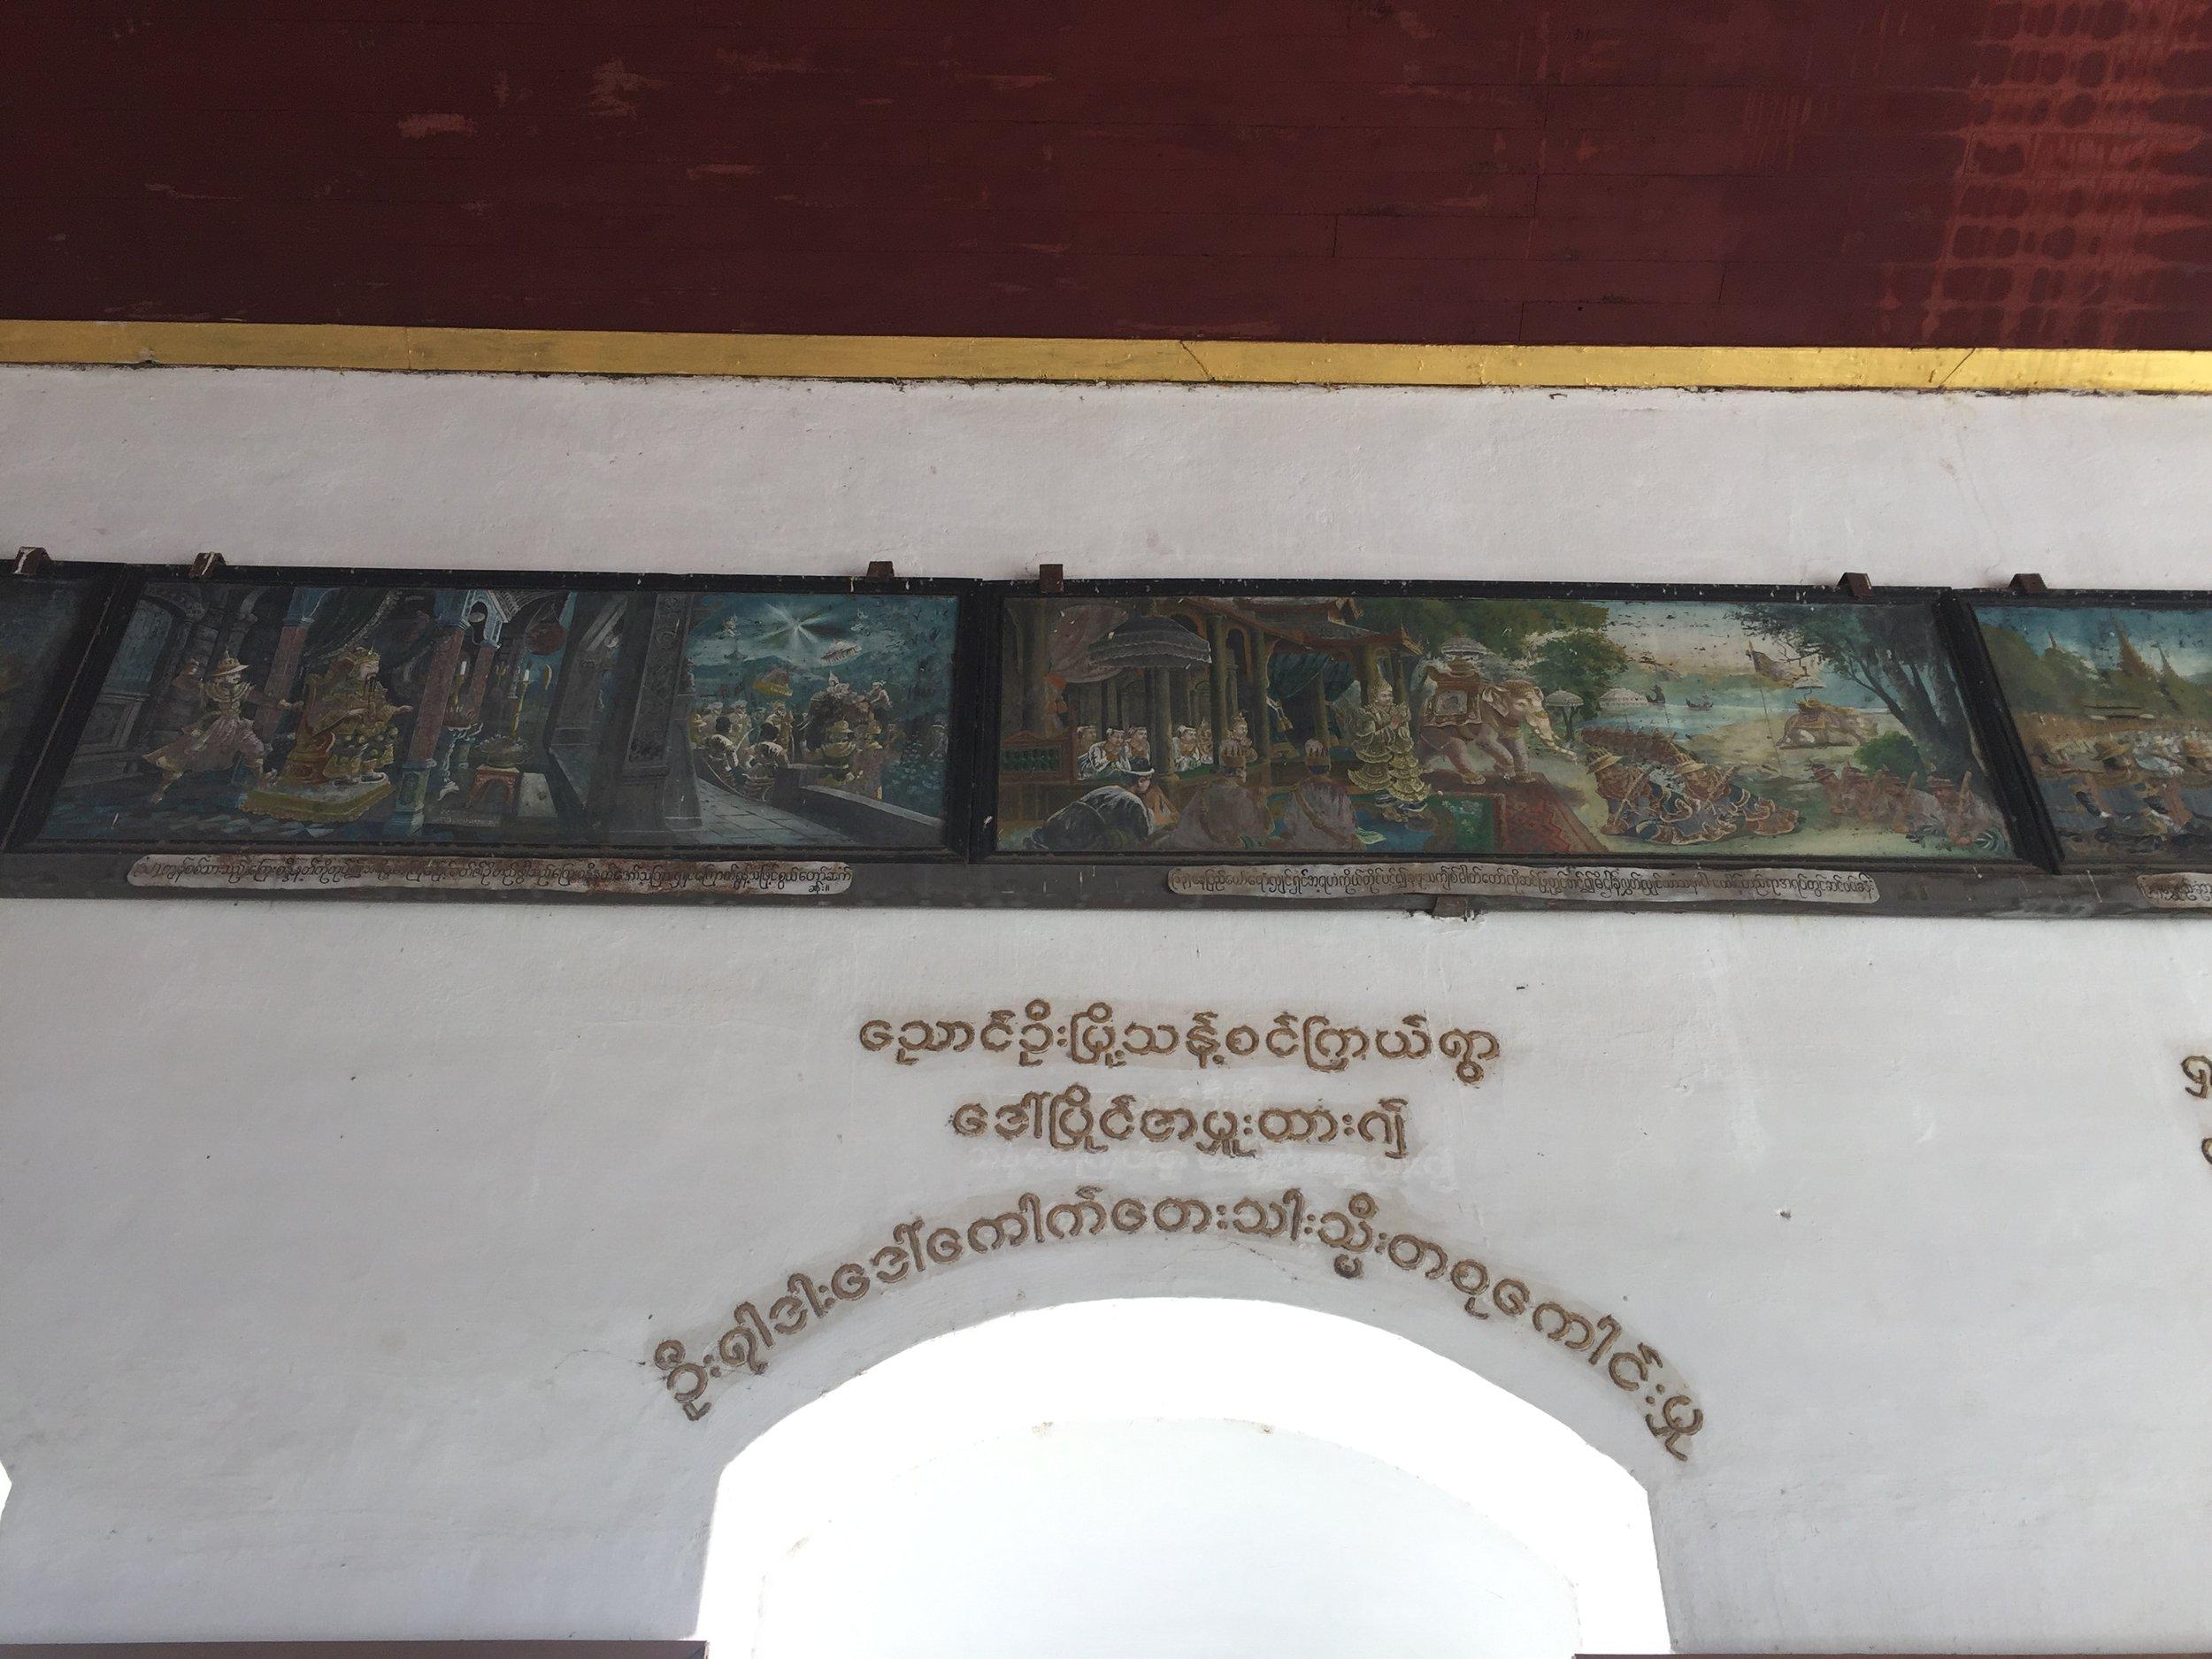 The strangely circular Burmese alphabet.